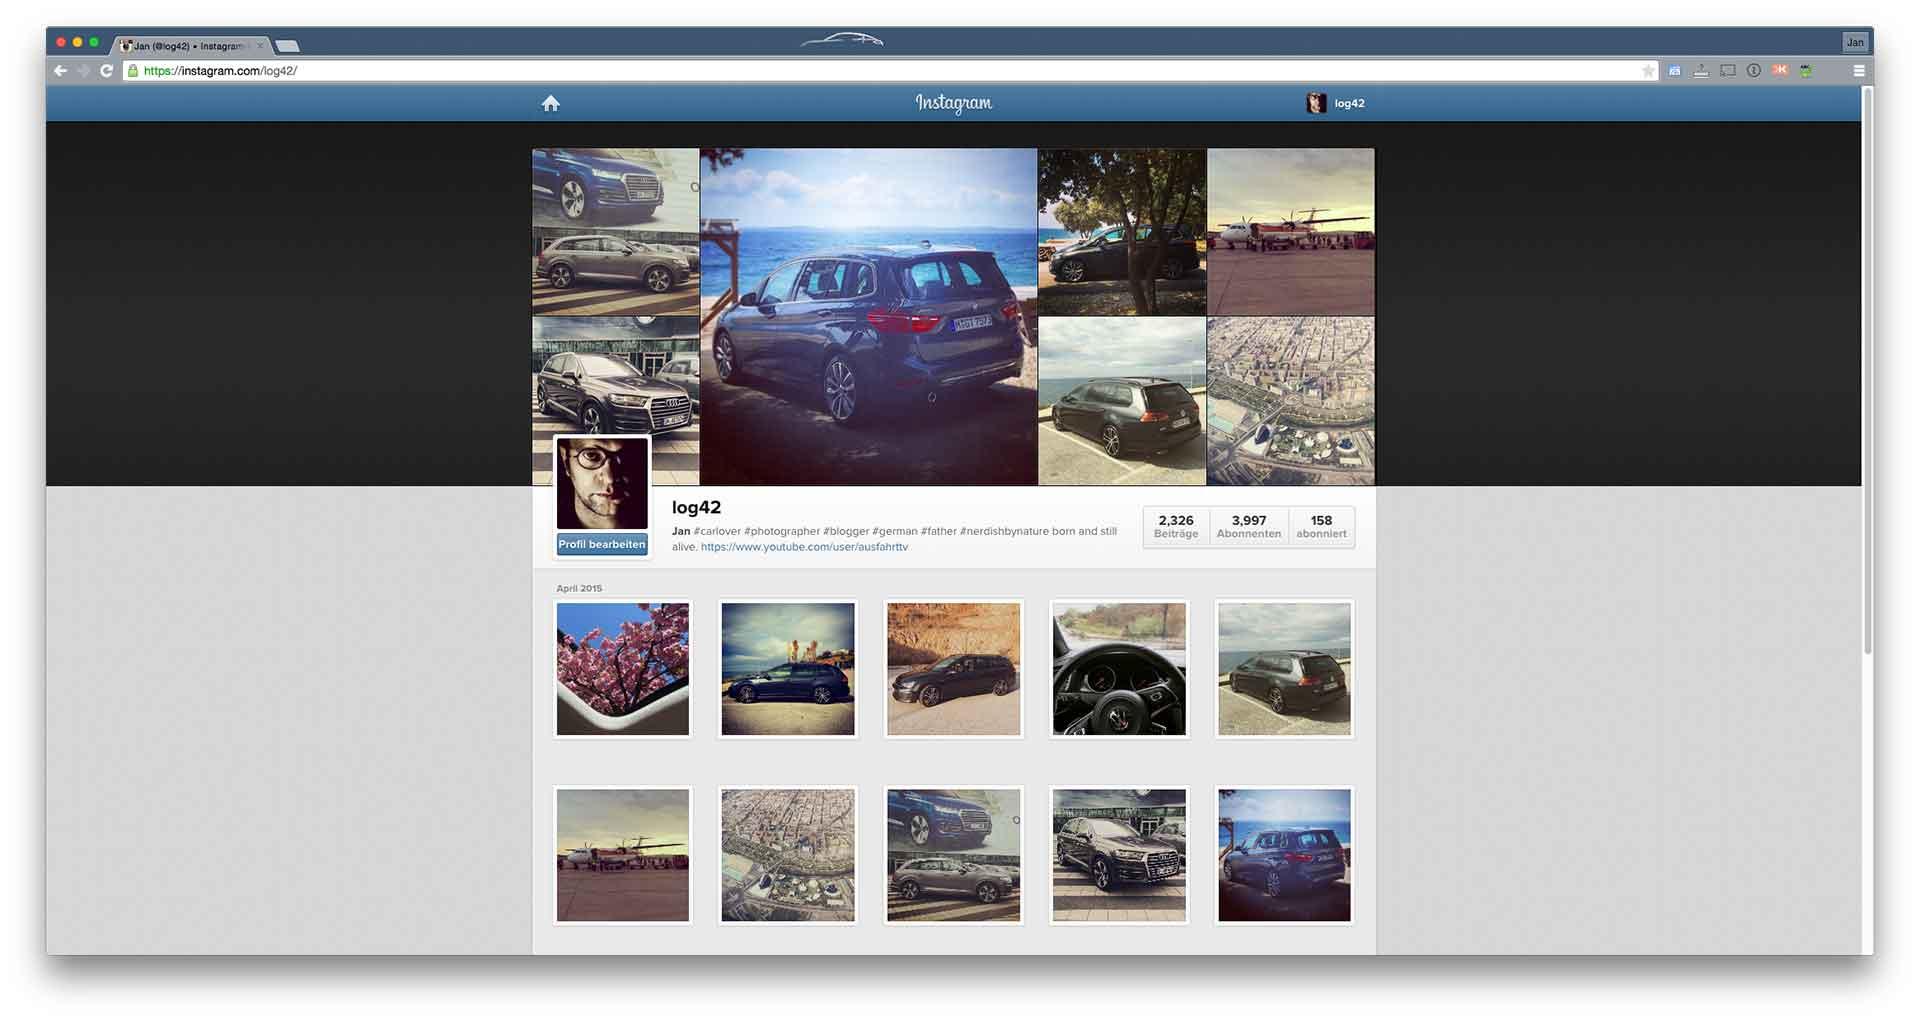 log42-instagram-autoblogger